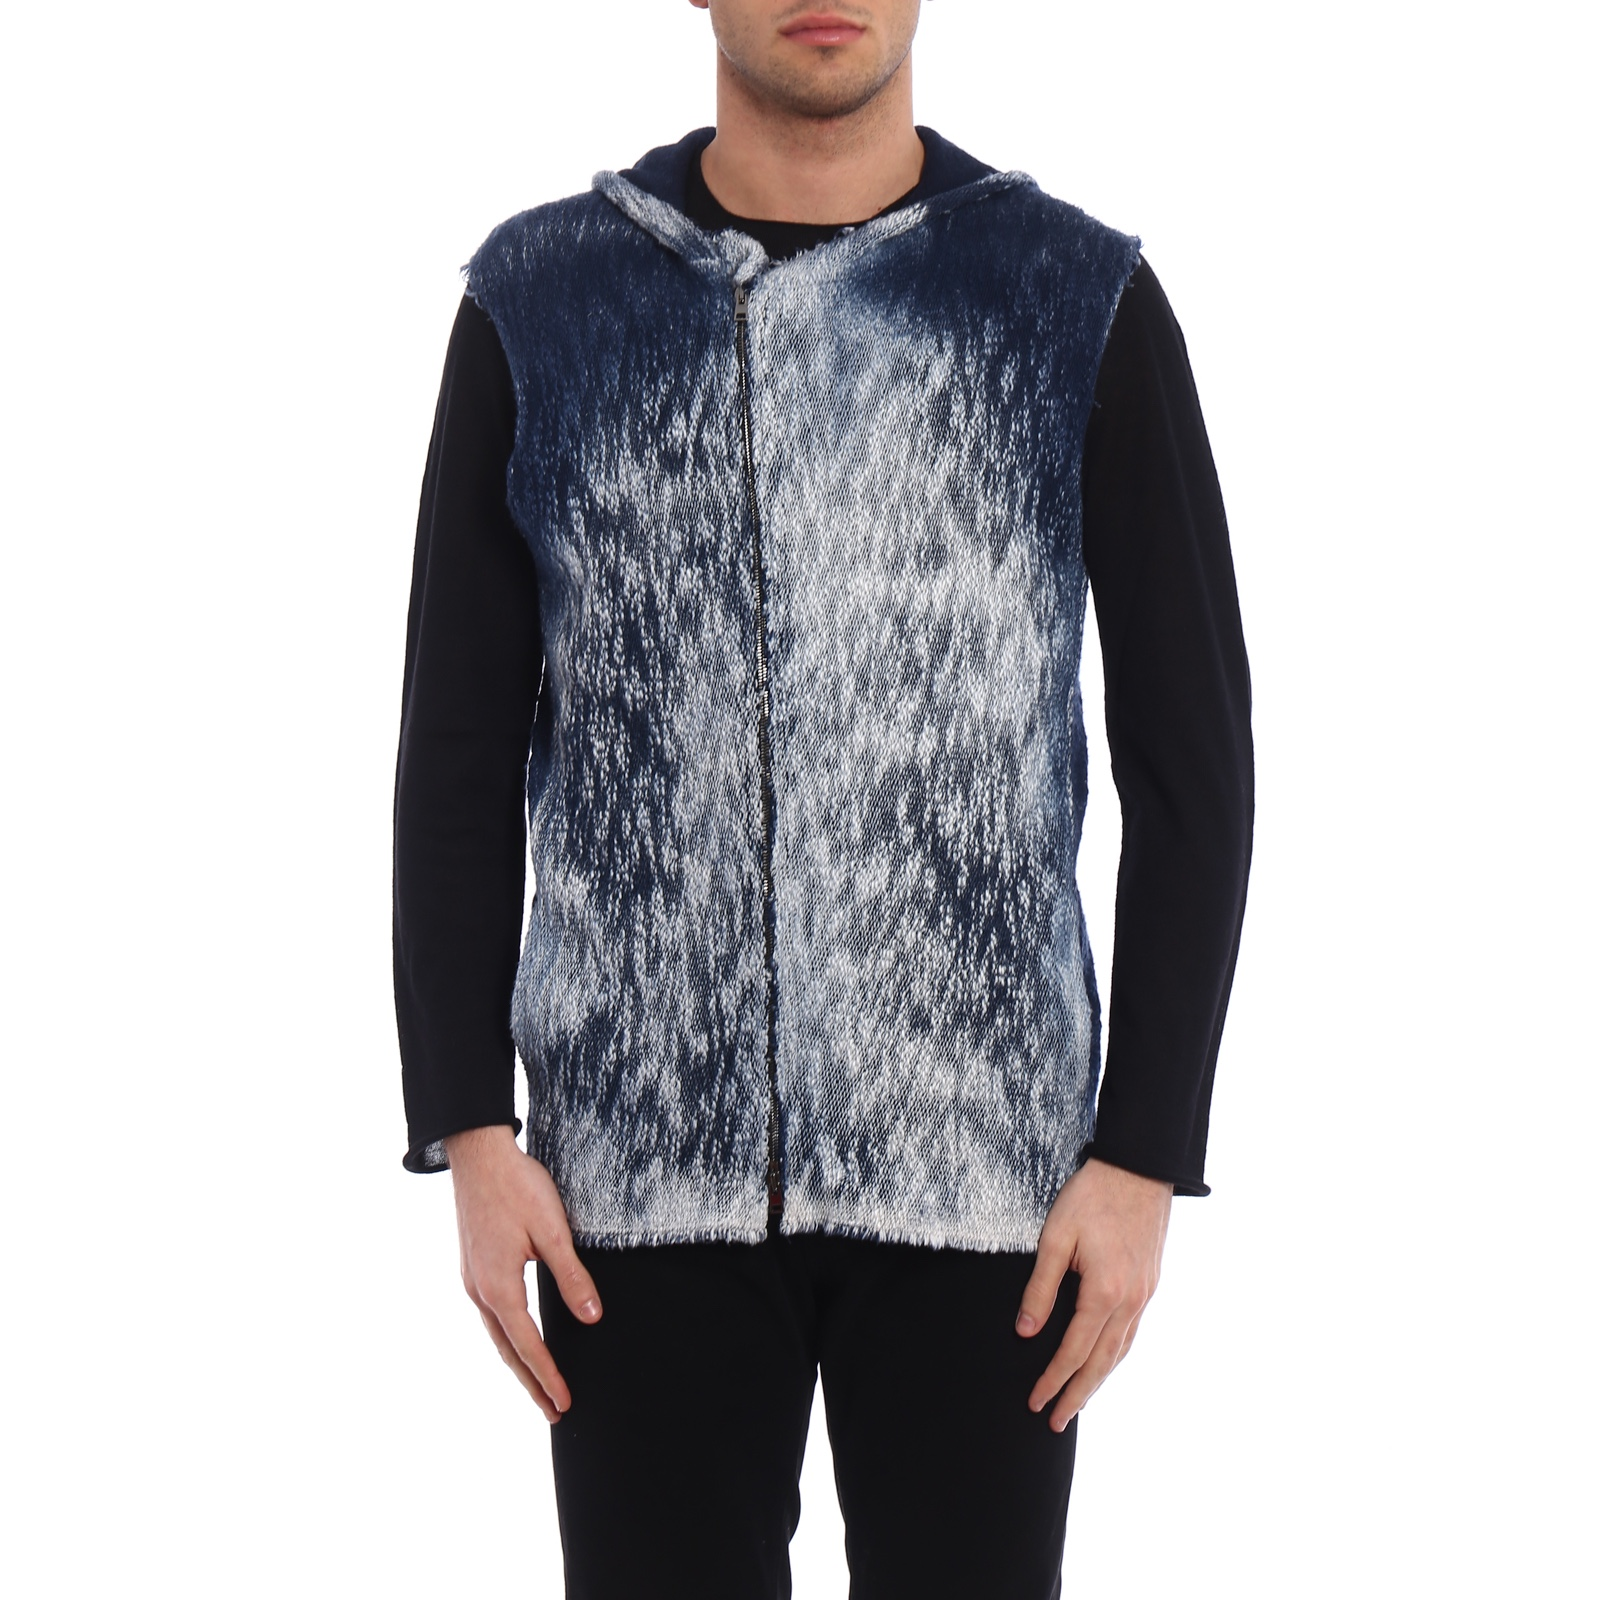 iKRIX-avant-toi-cardigans-malfil-cotton-sleeveless-cardigan-00000121358f00s003.jpg